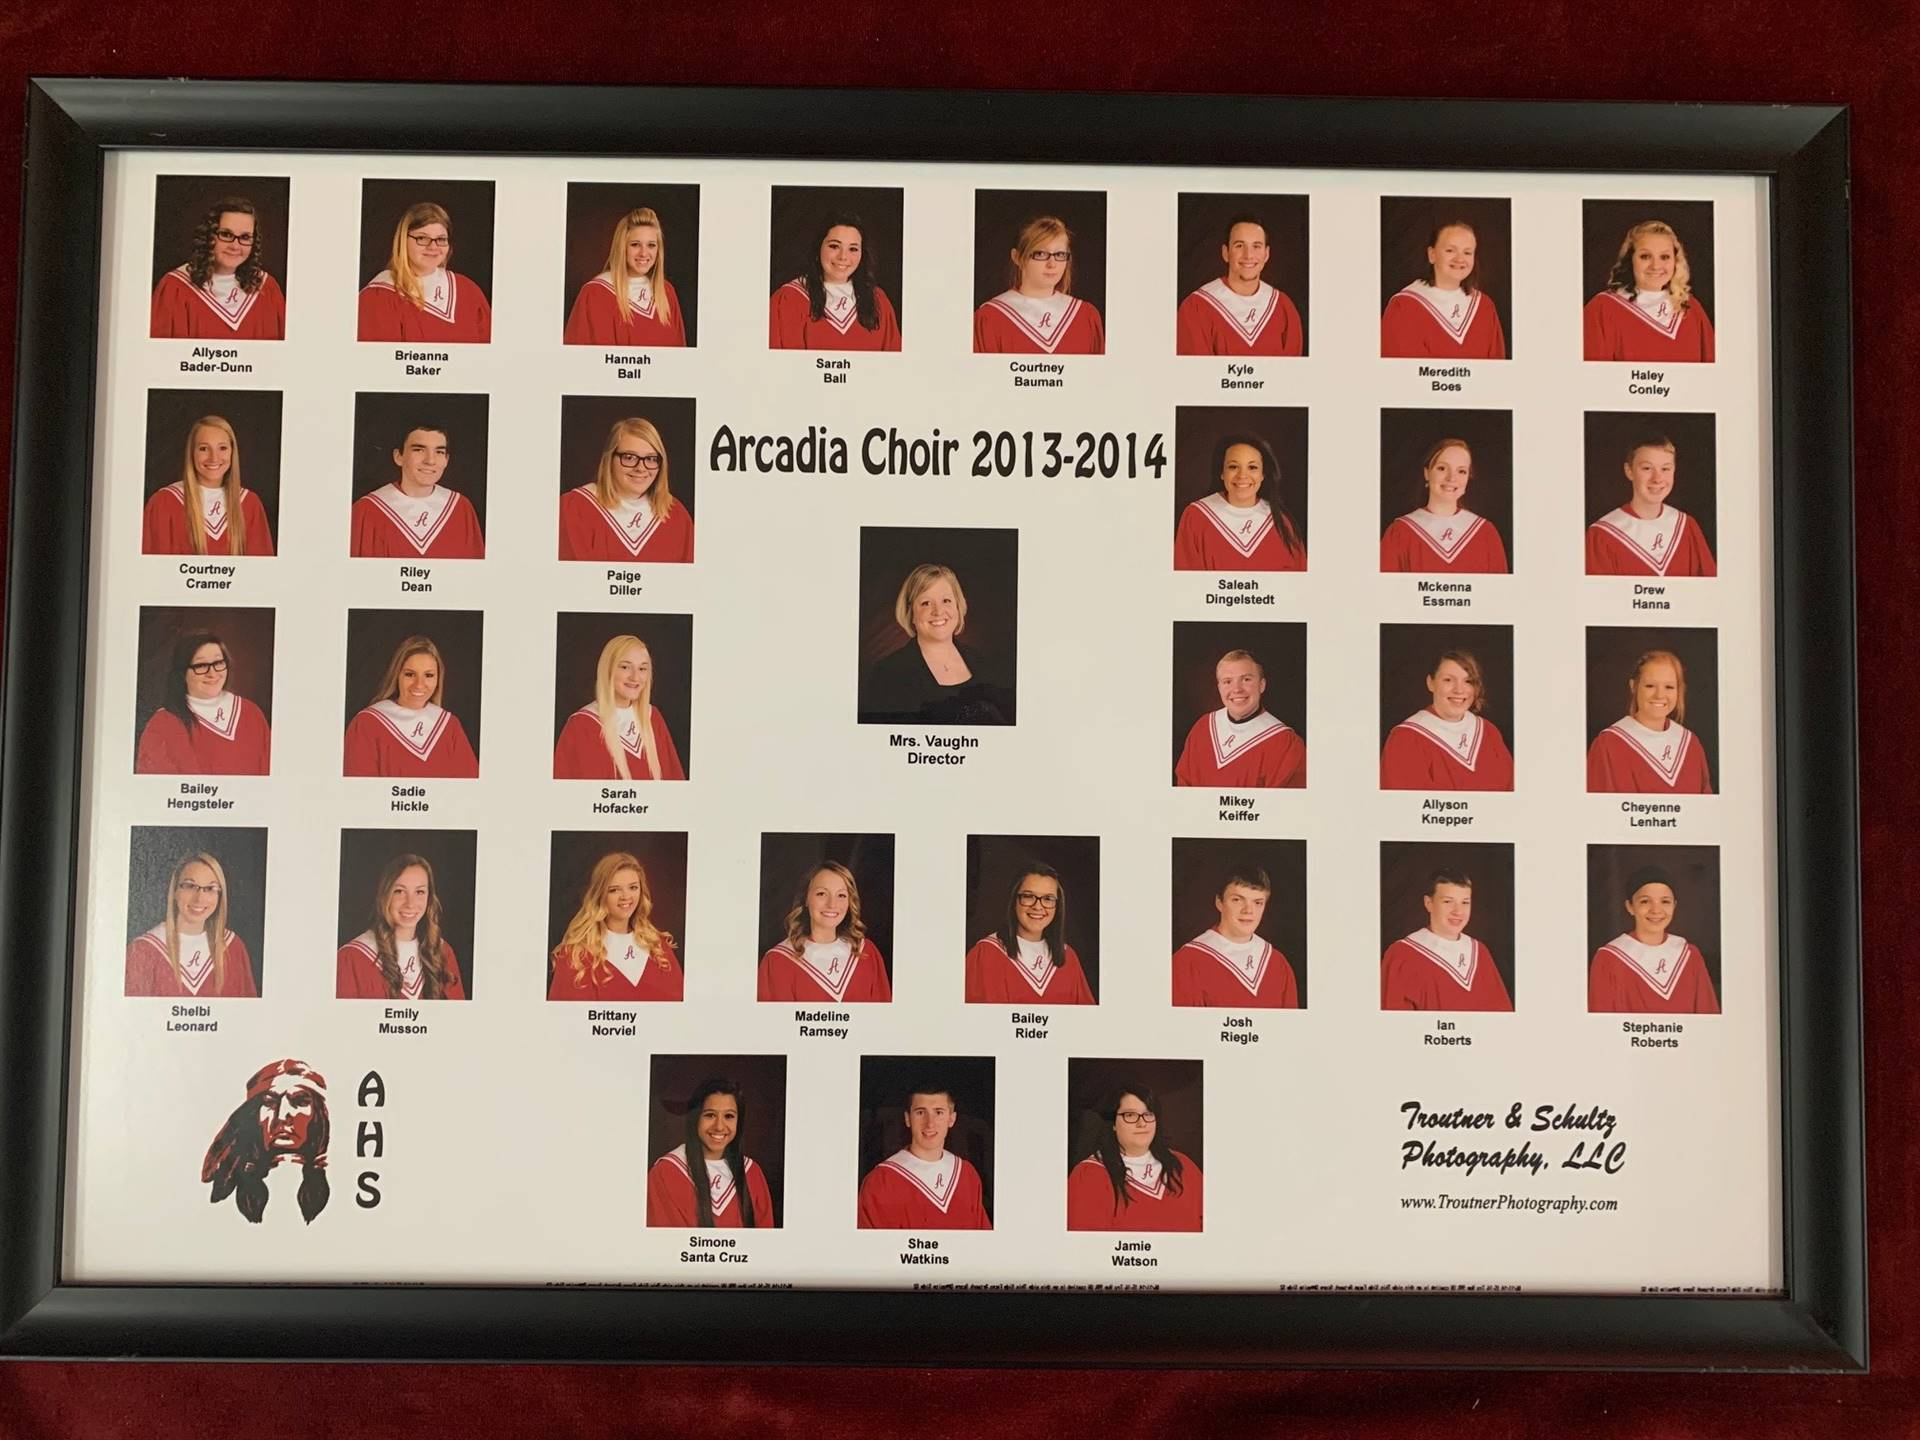 Arcadia High School Choir 2013-2014